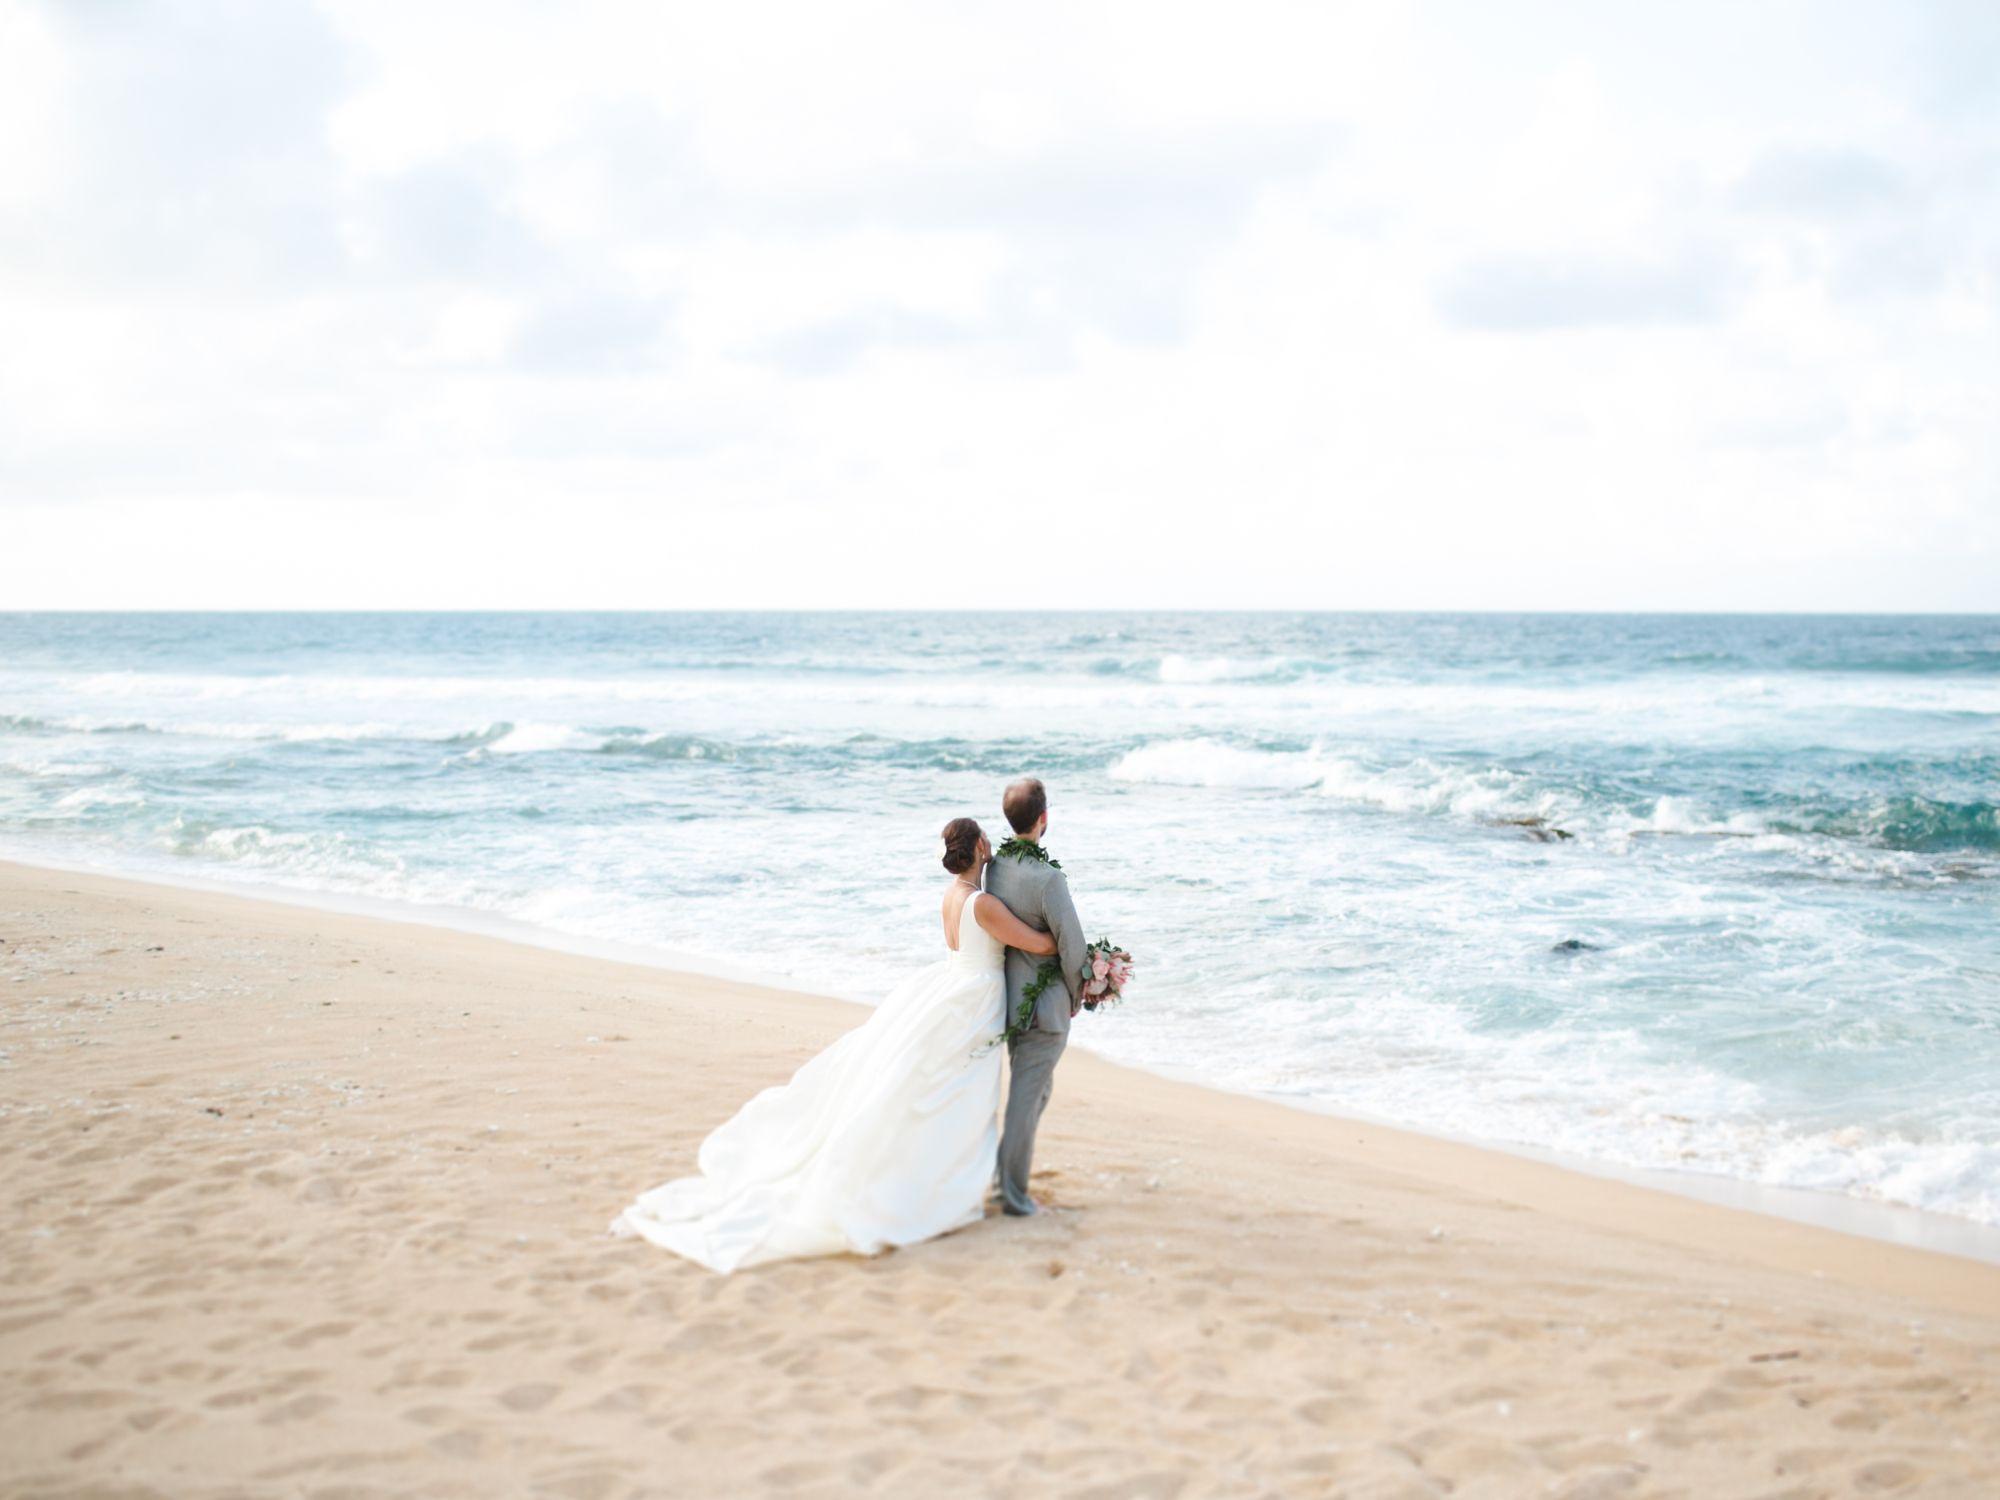 Stjens 86 Kauaibeach Weddingsanniversary